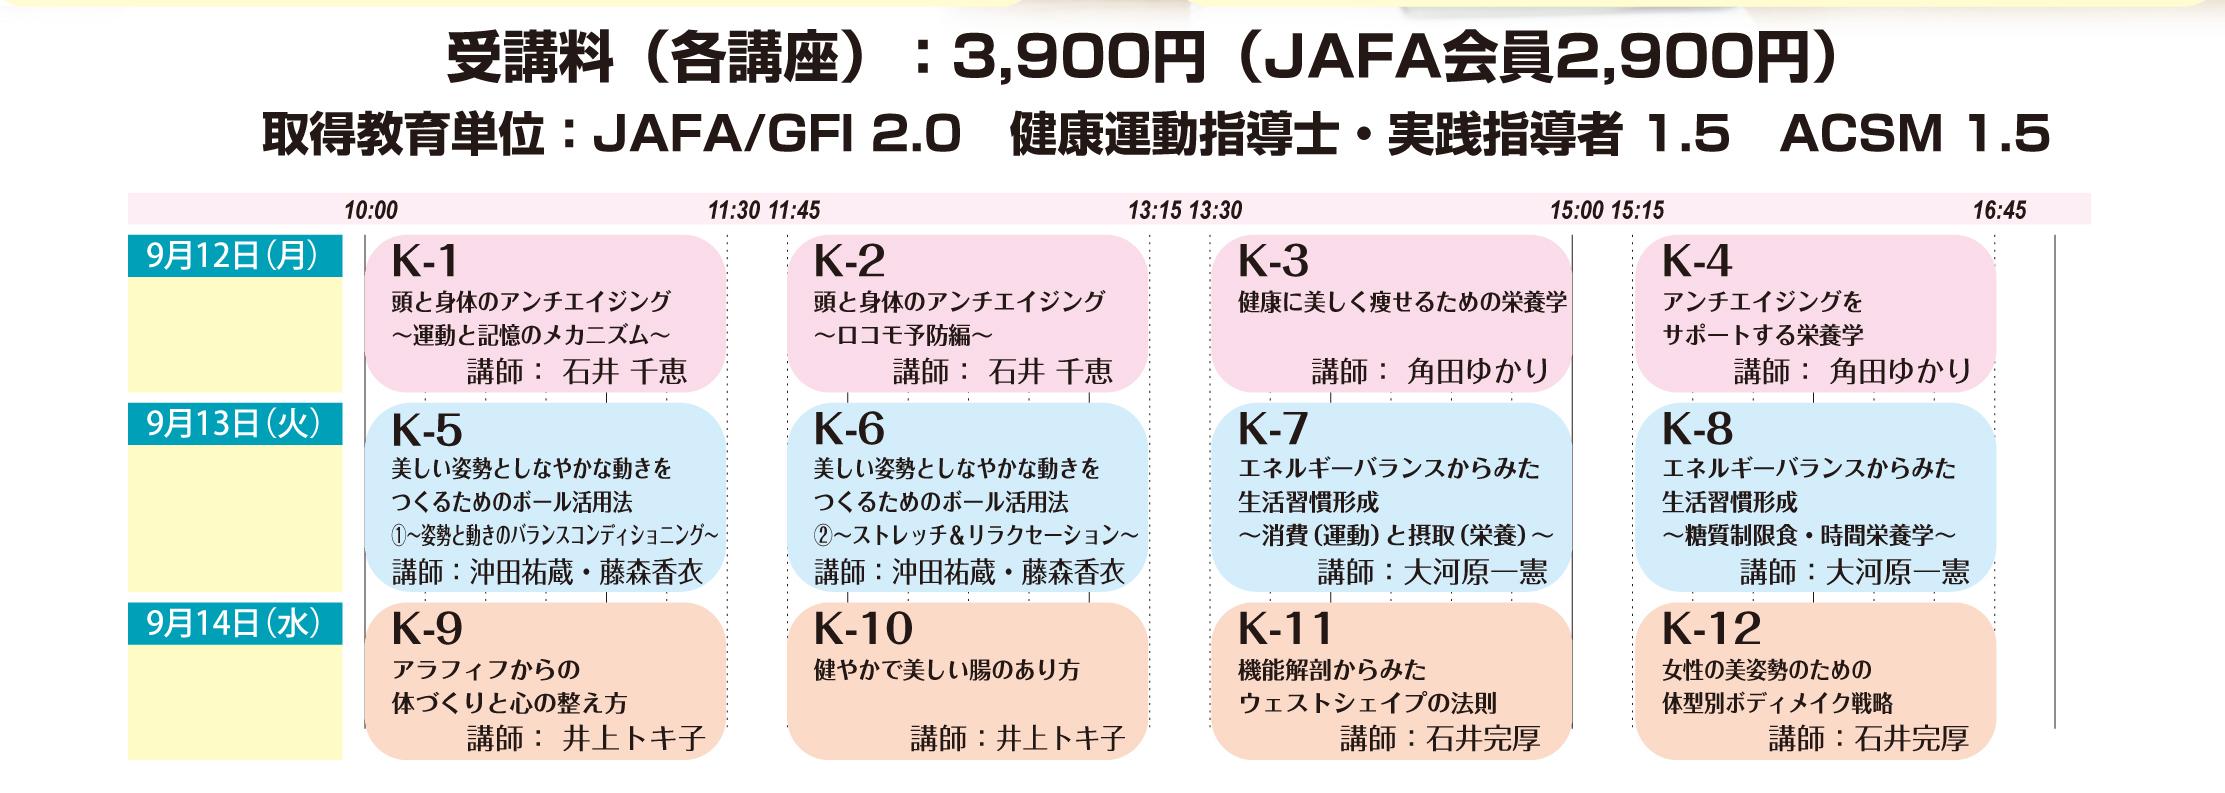 http://www.jafanet.jp/event/%E3%82%AB%E3%83%AC%E3%83%83%E3%82%B82016time.jpg